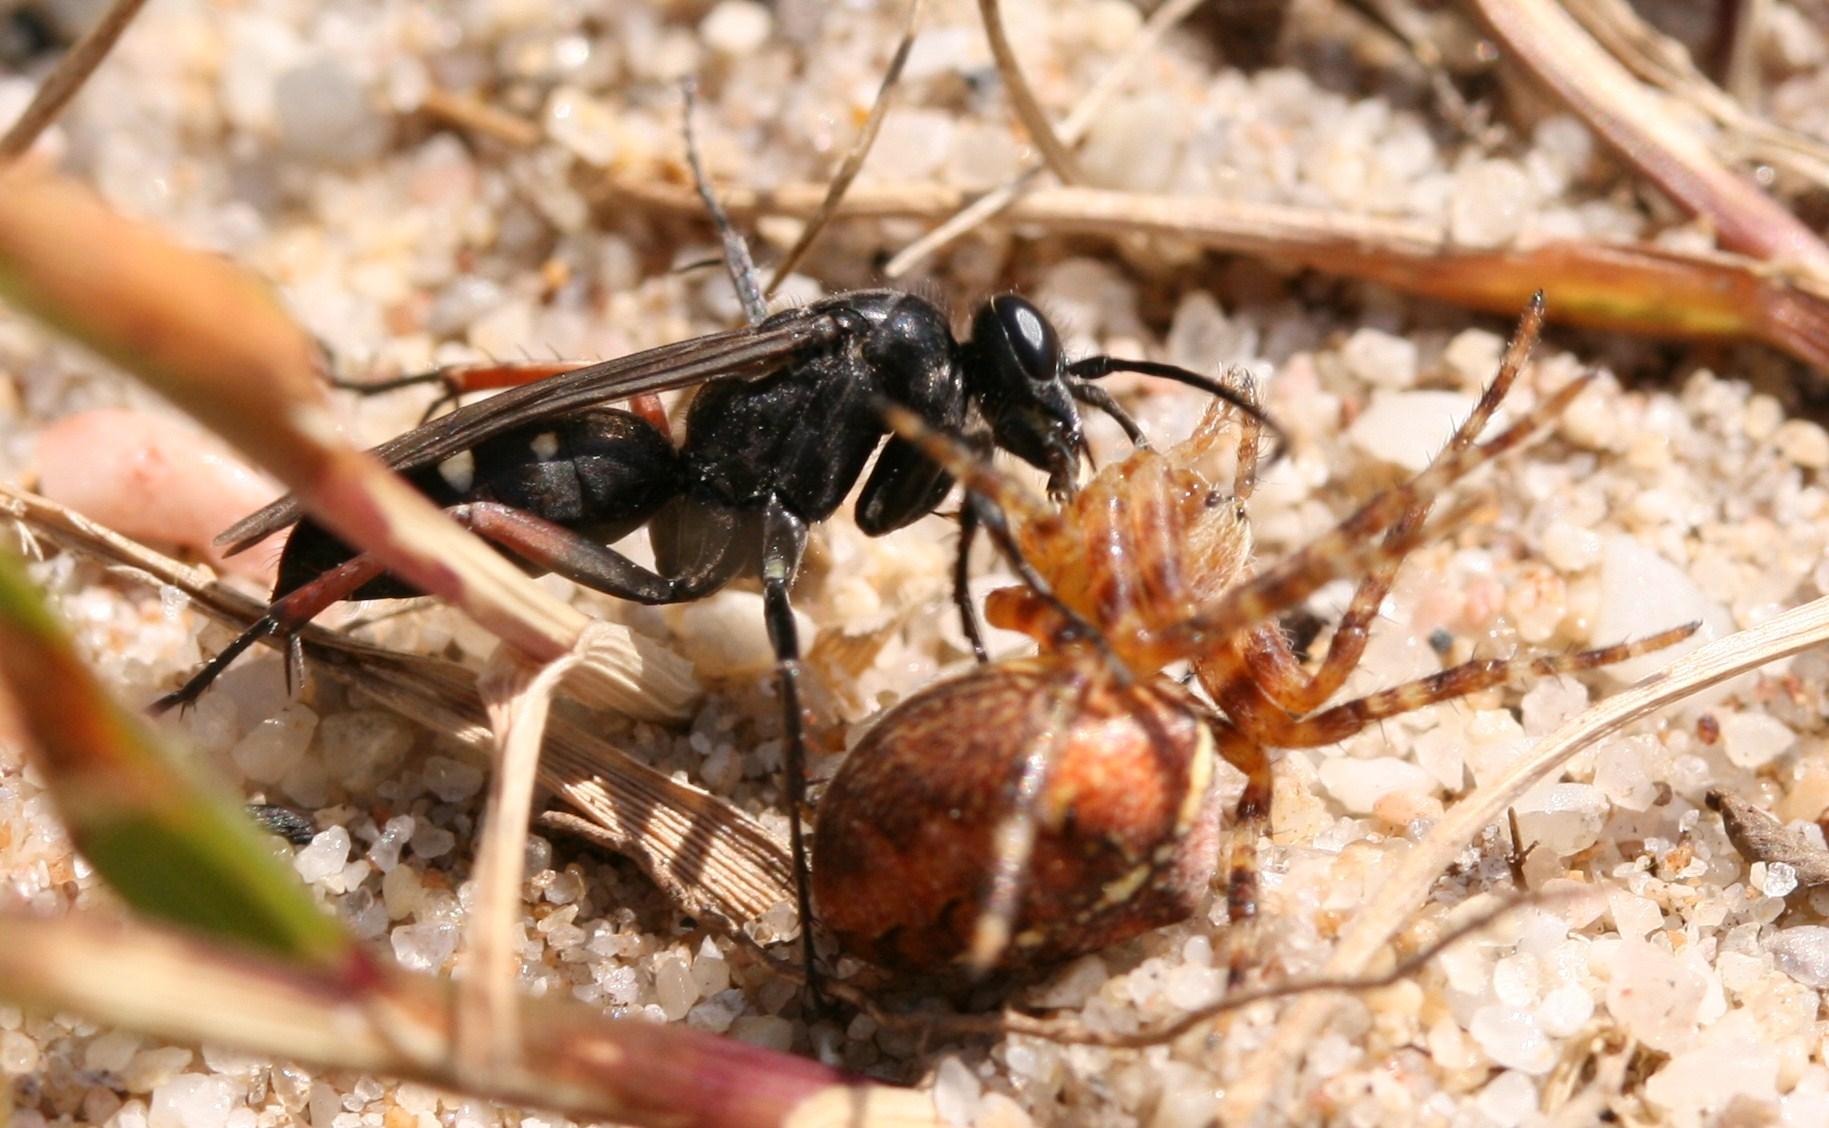 Pompilid (Episyron sp.) dragging its prey (Araneus diadematus) to meet its doom